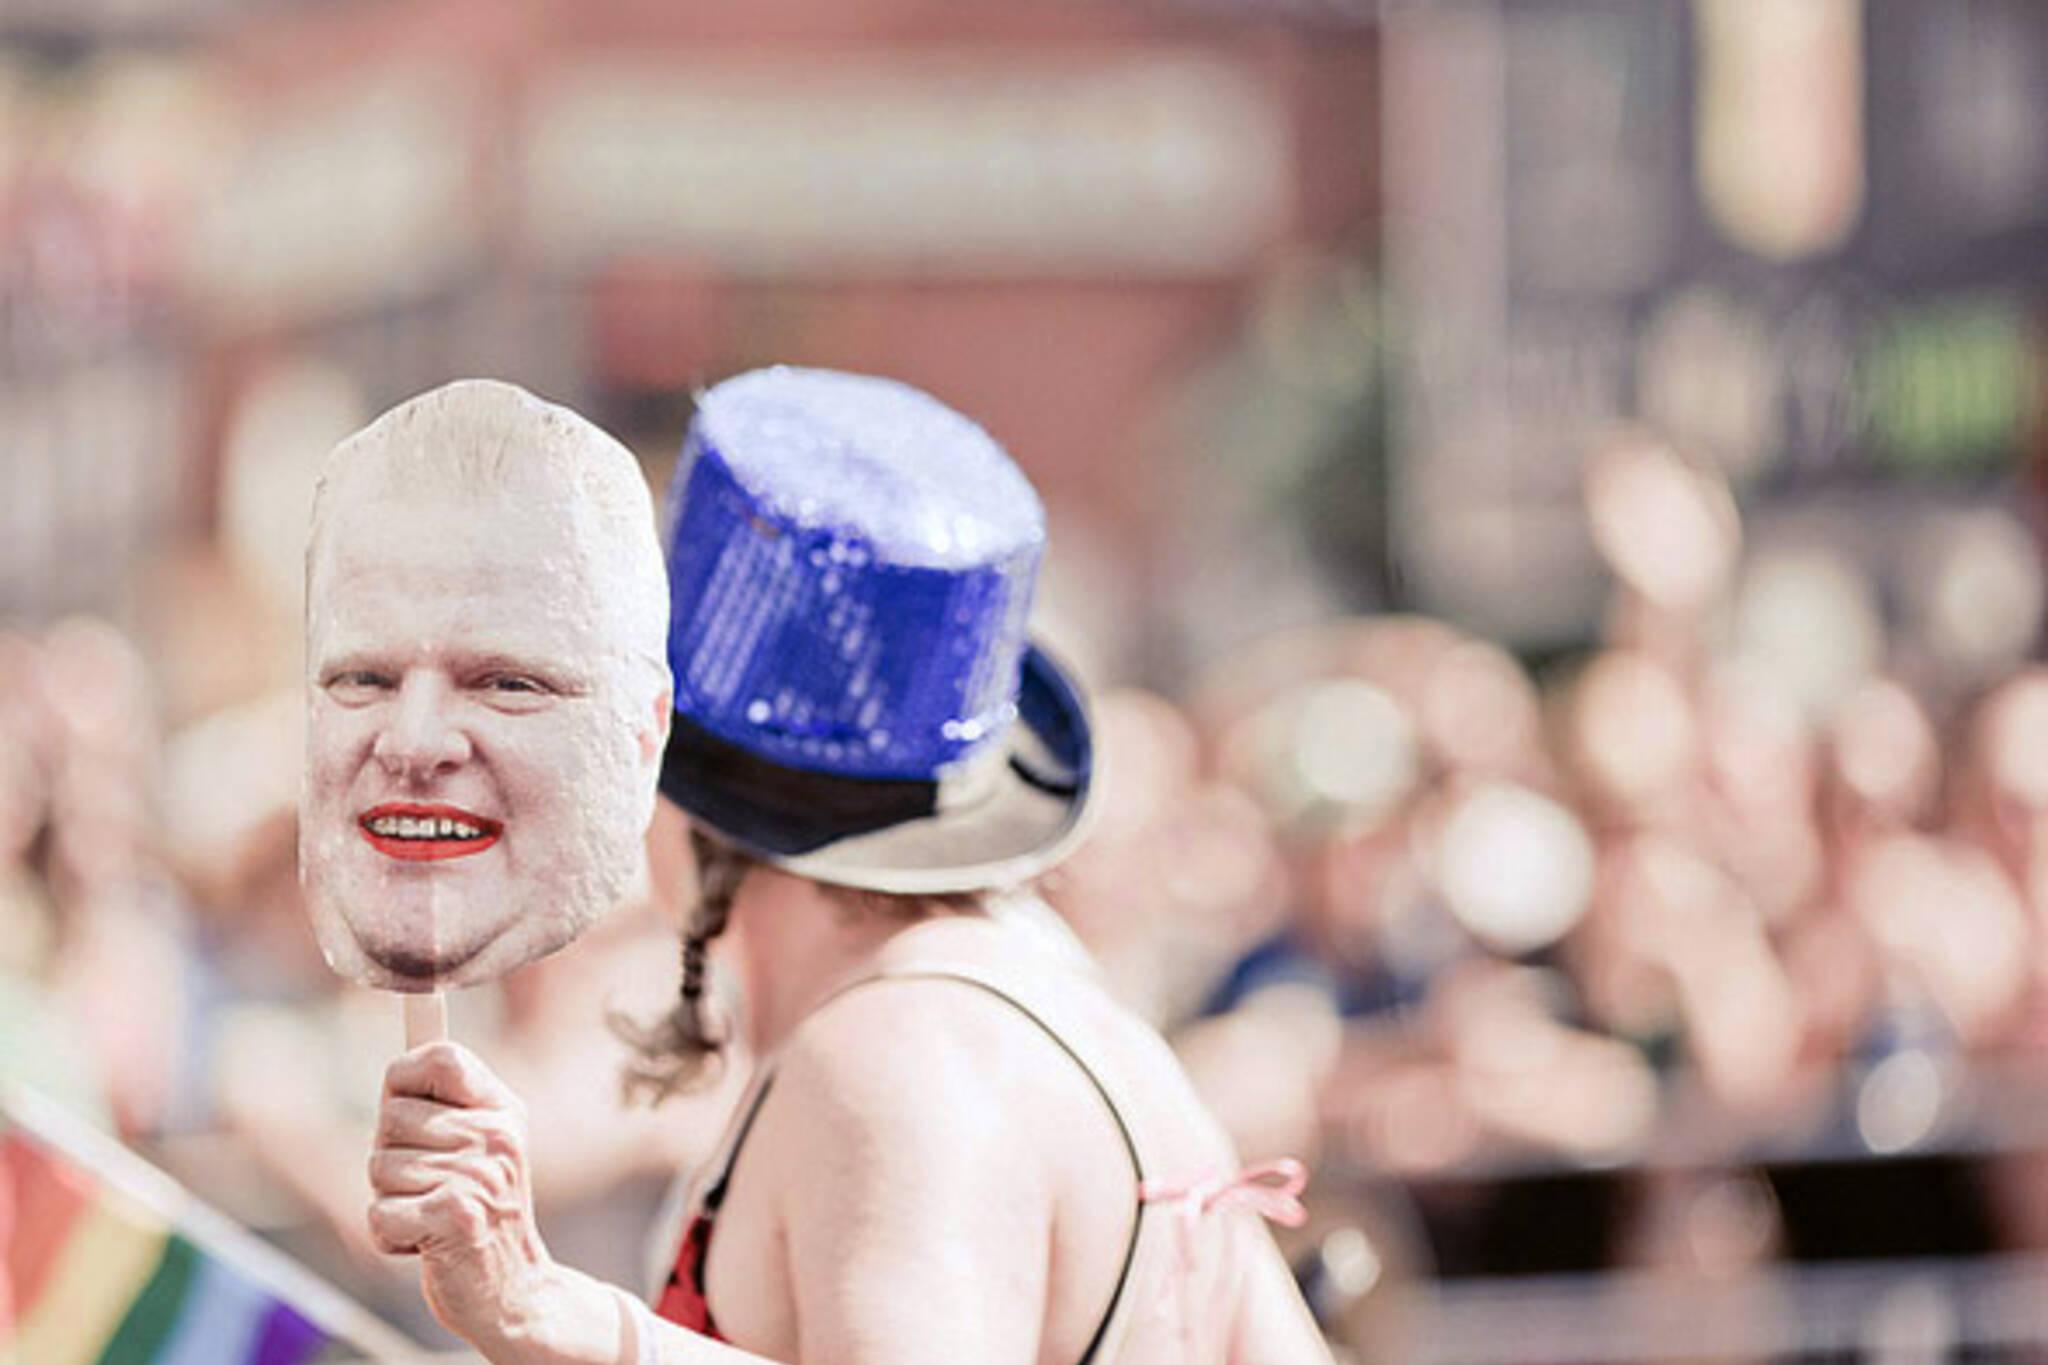 Rob Ford skip World Pride Toronto